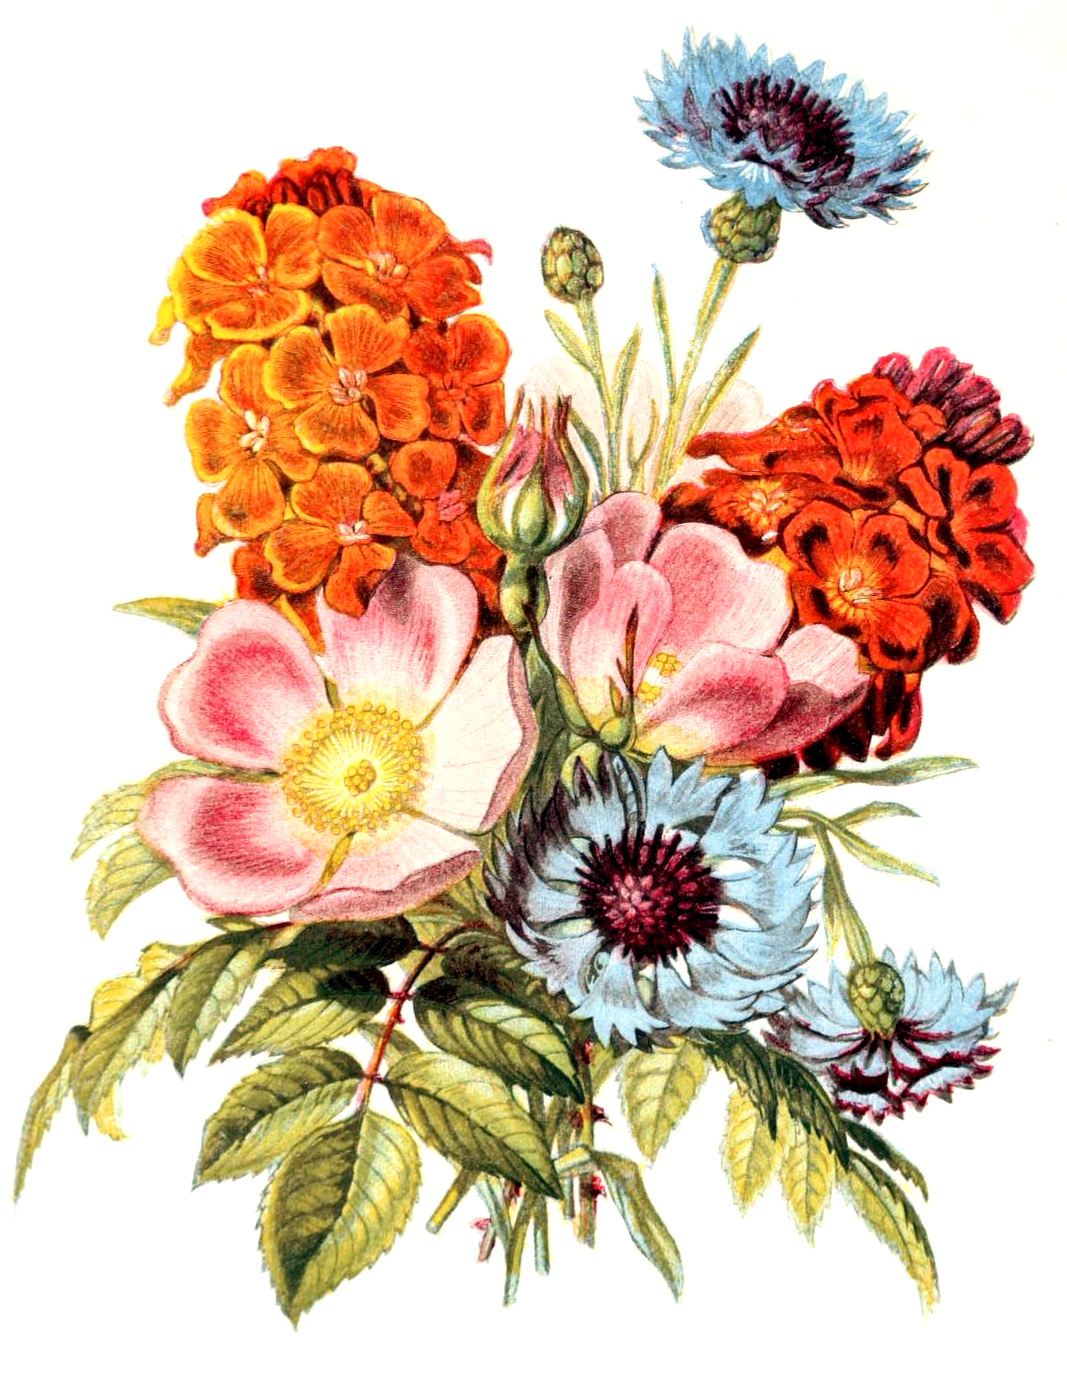 Картинки нарисованных букетов